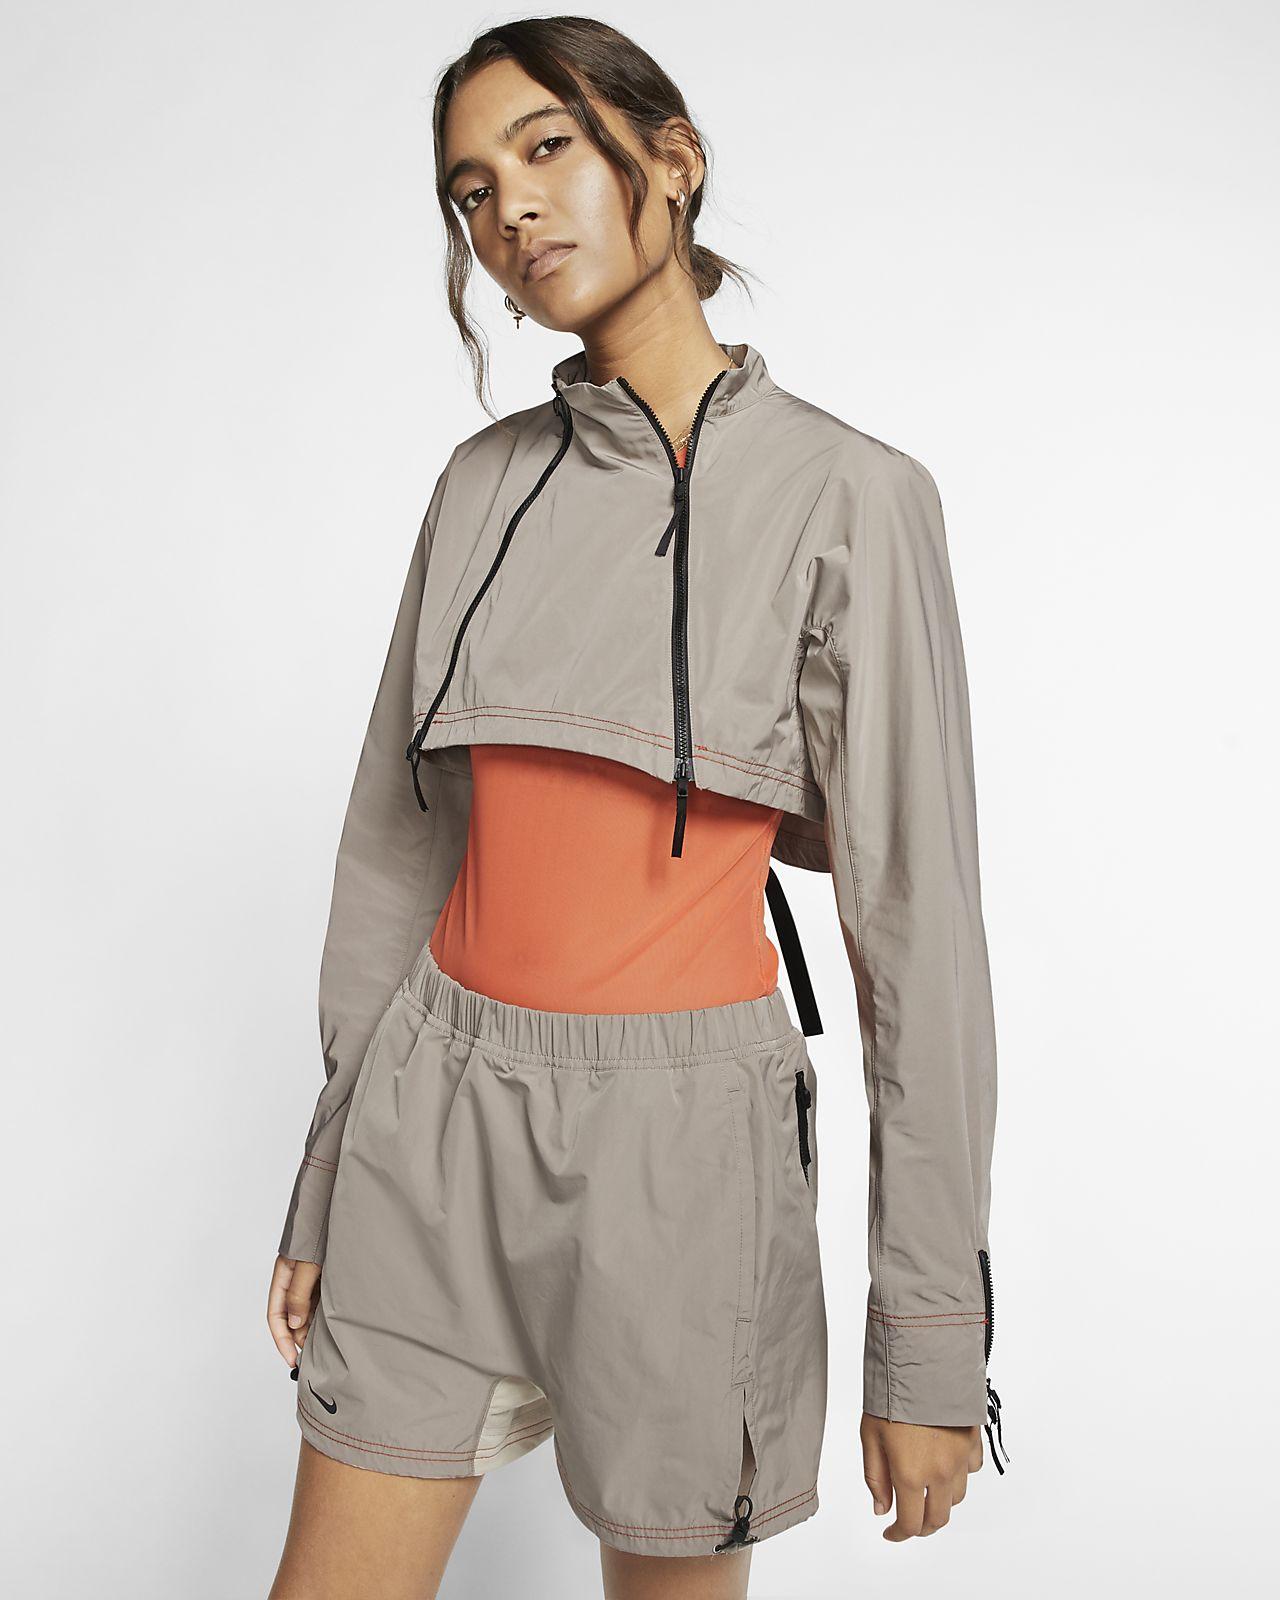 Nike A.A.E. Women's Jacket